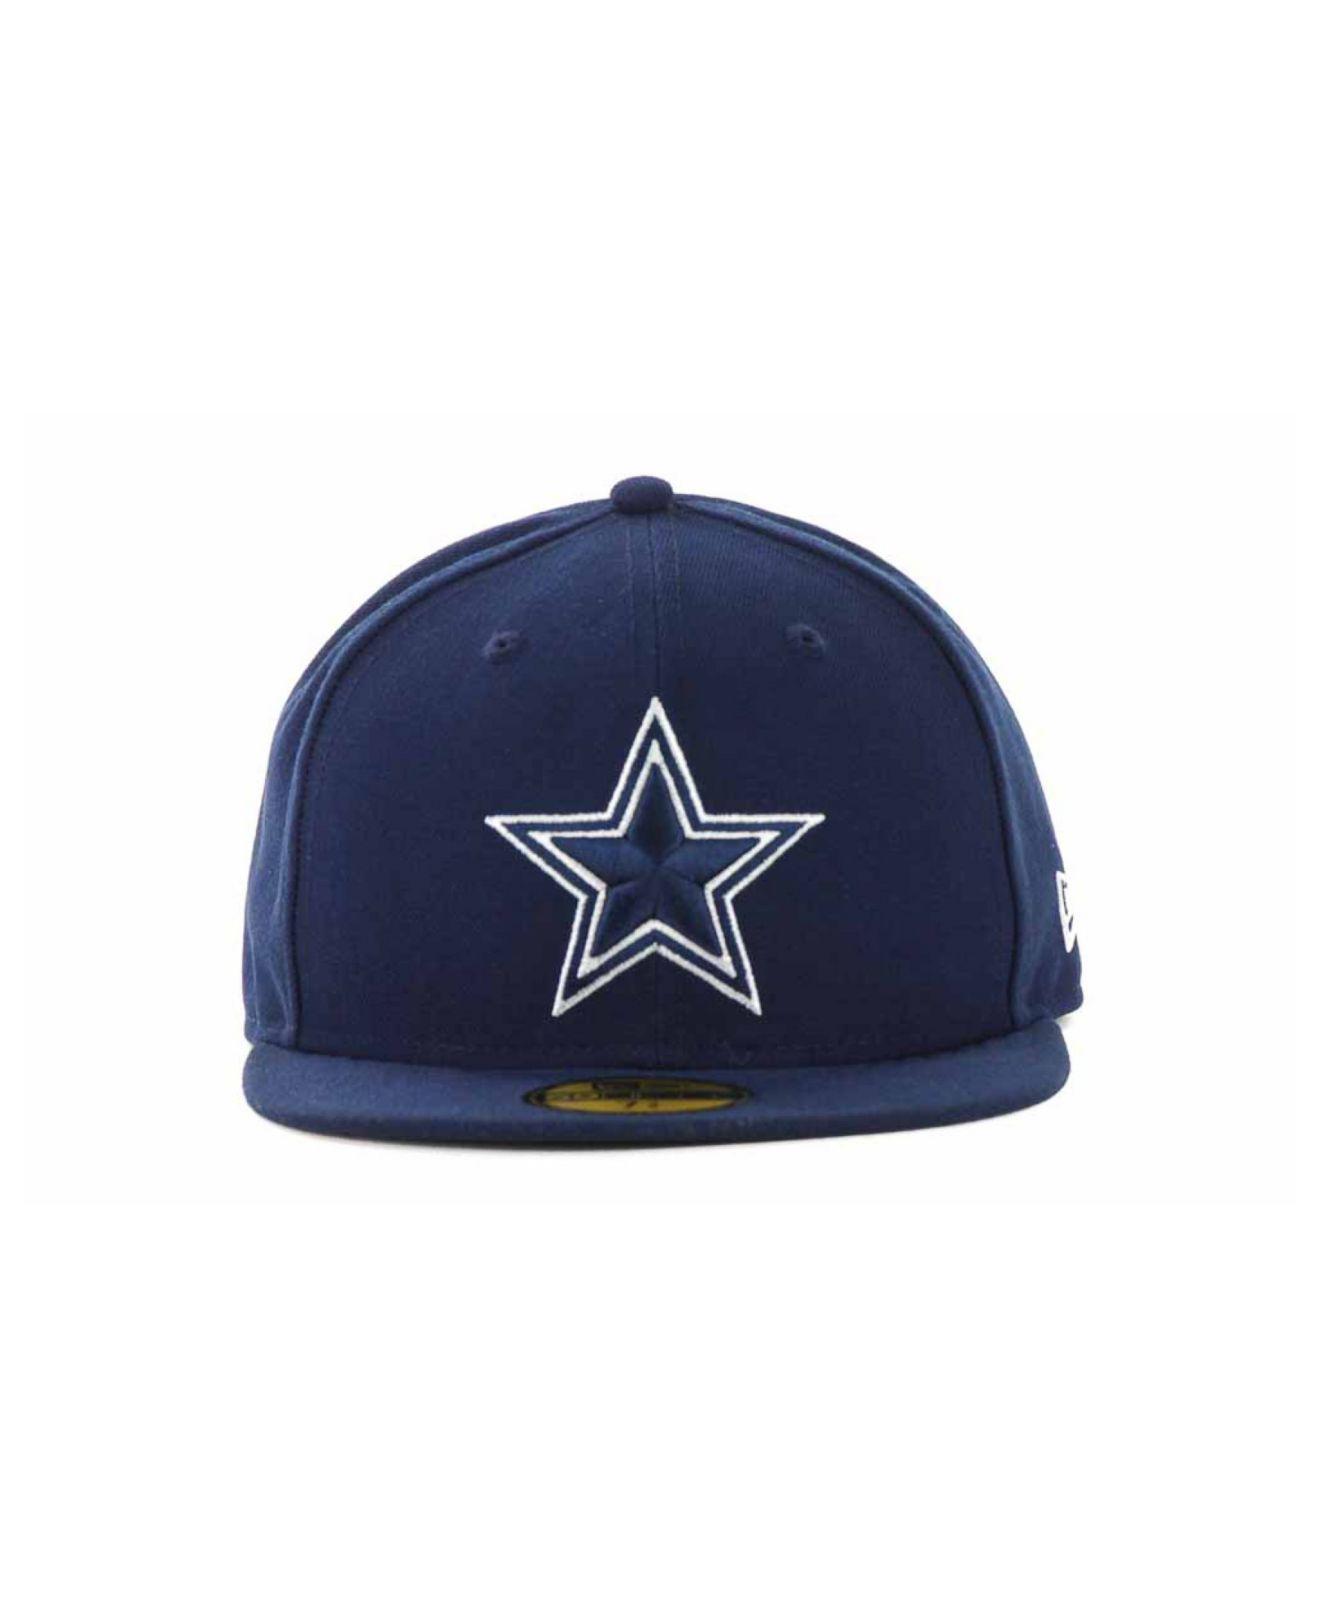 87627f123a6b3d ... ebay lyst ktz dallas cowboys nfl classic on field 59fifty cap in blue  for men a35c0